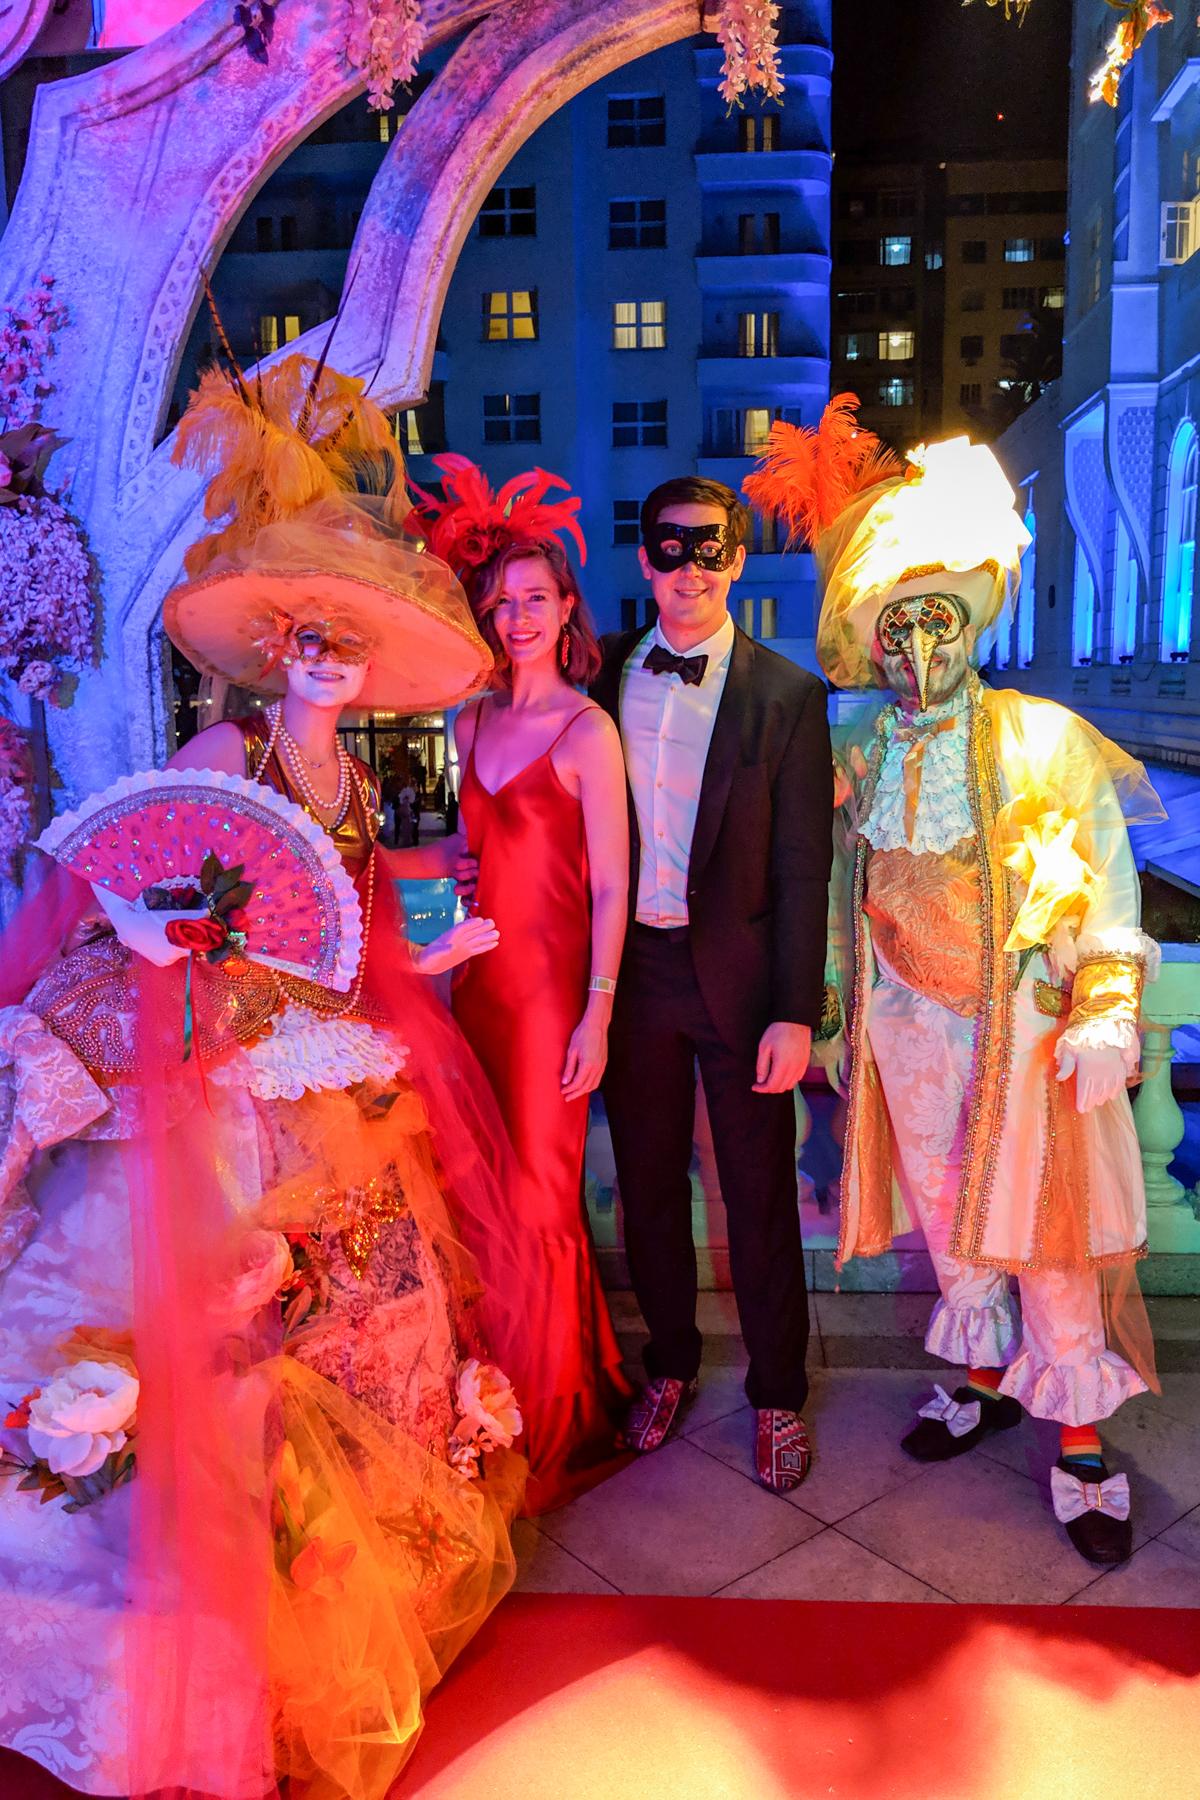 Stacie Flinner x Belmond Copacabana Carnival Ball-12.jpg